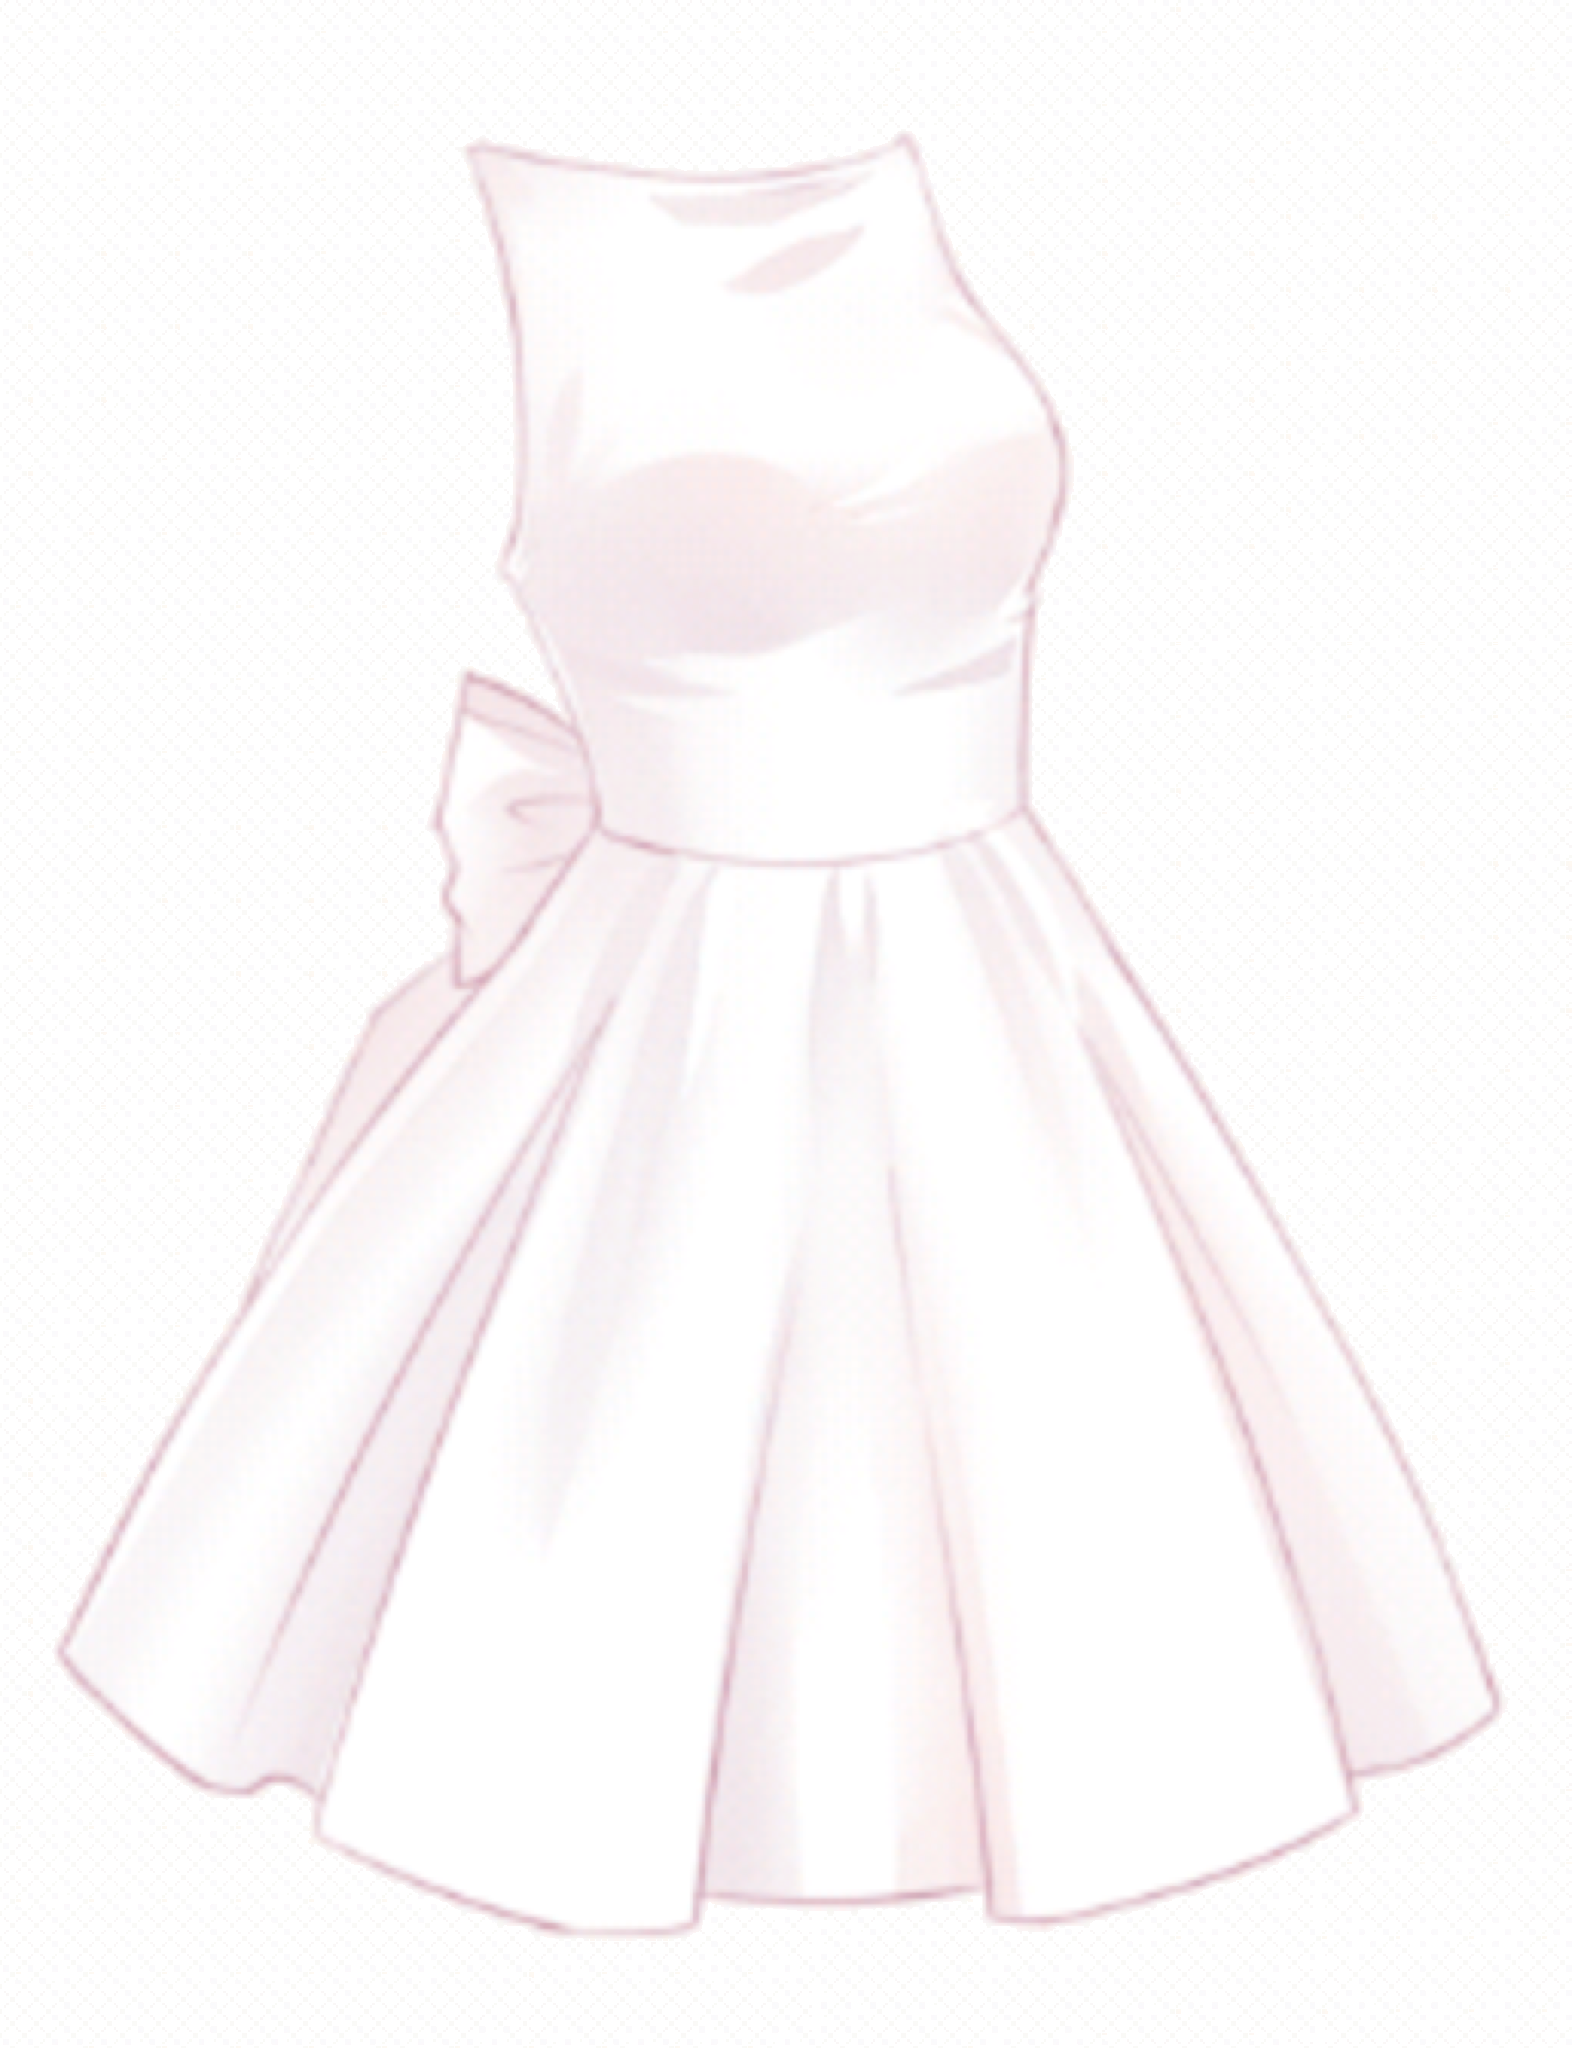 Mini Skirt Dress PNG